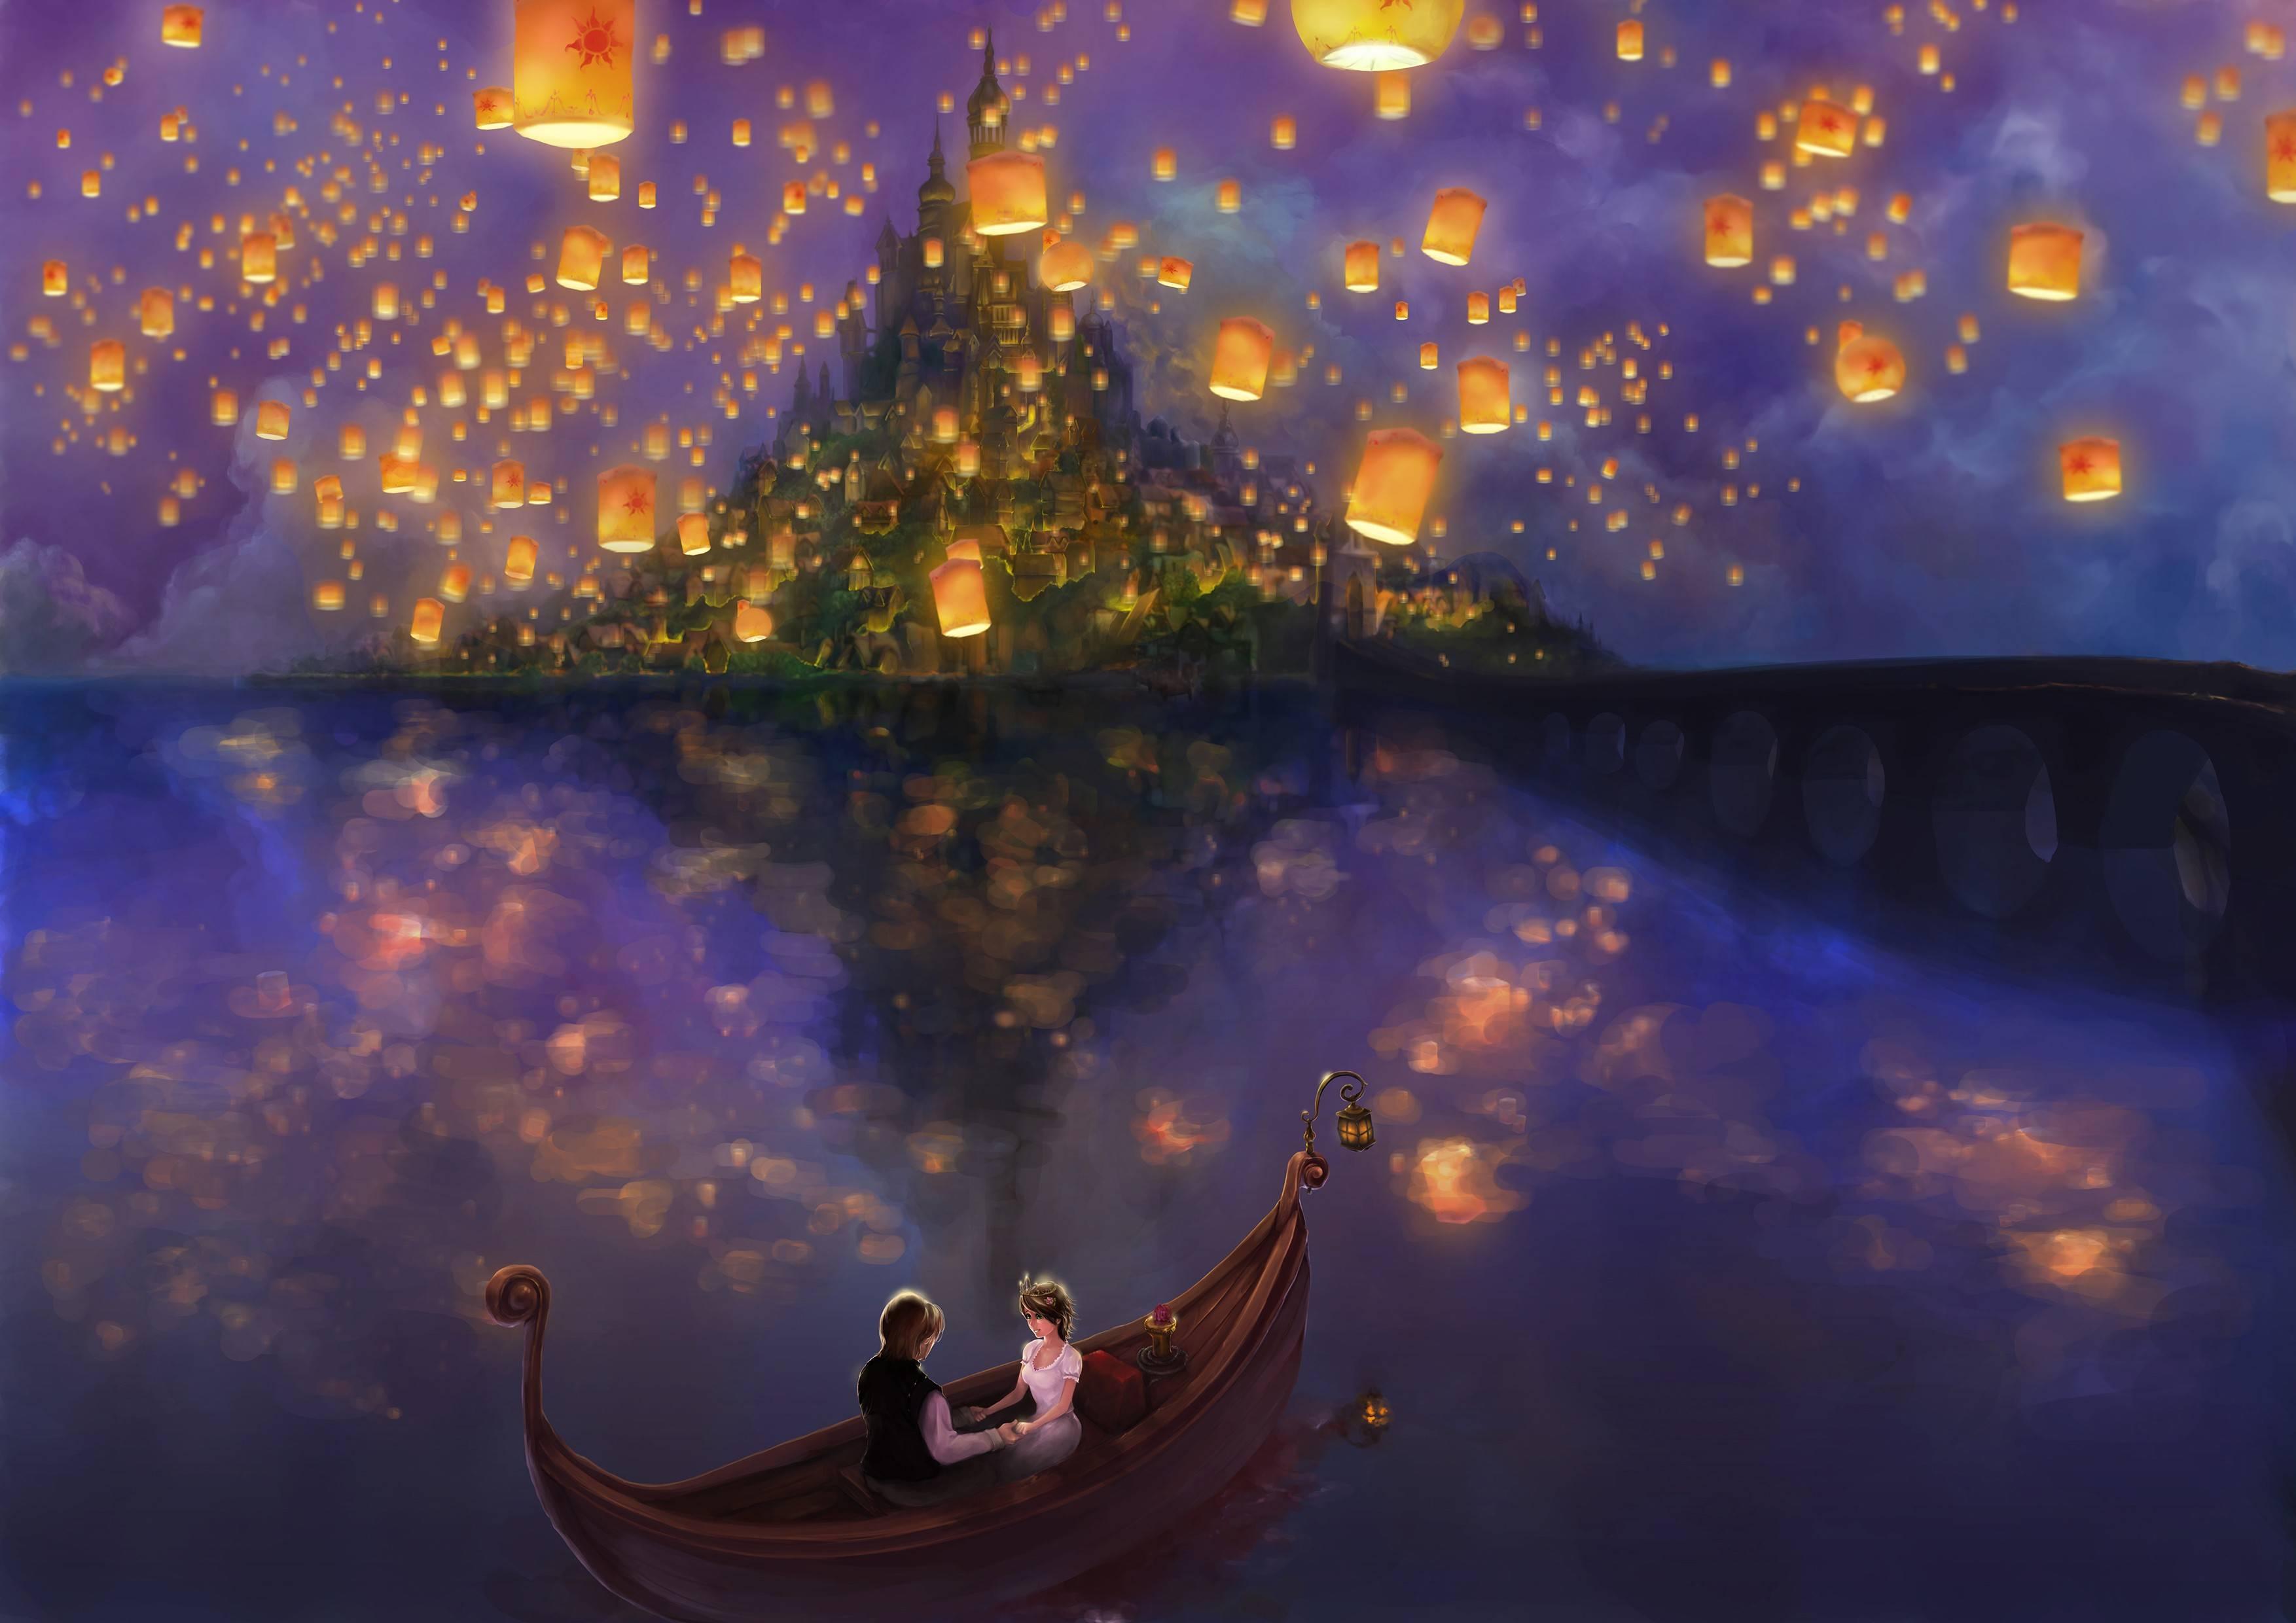 HD Disney Tangled Backgrounds 3508x2480